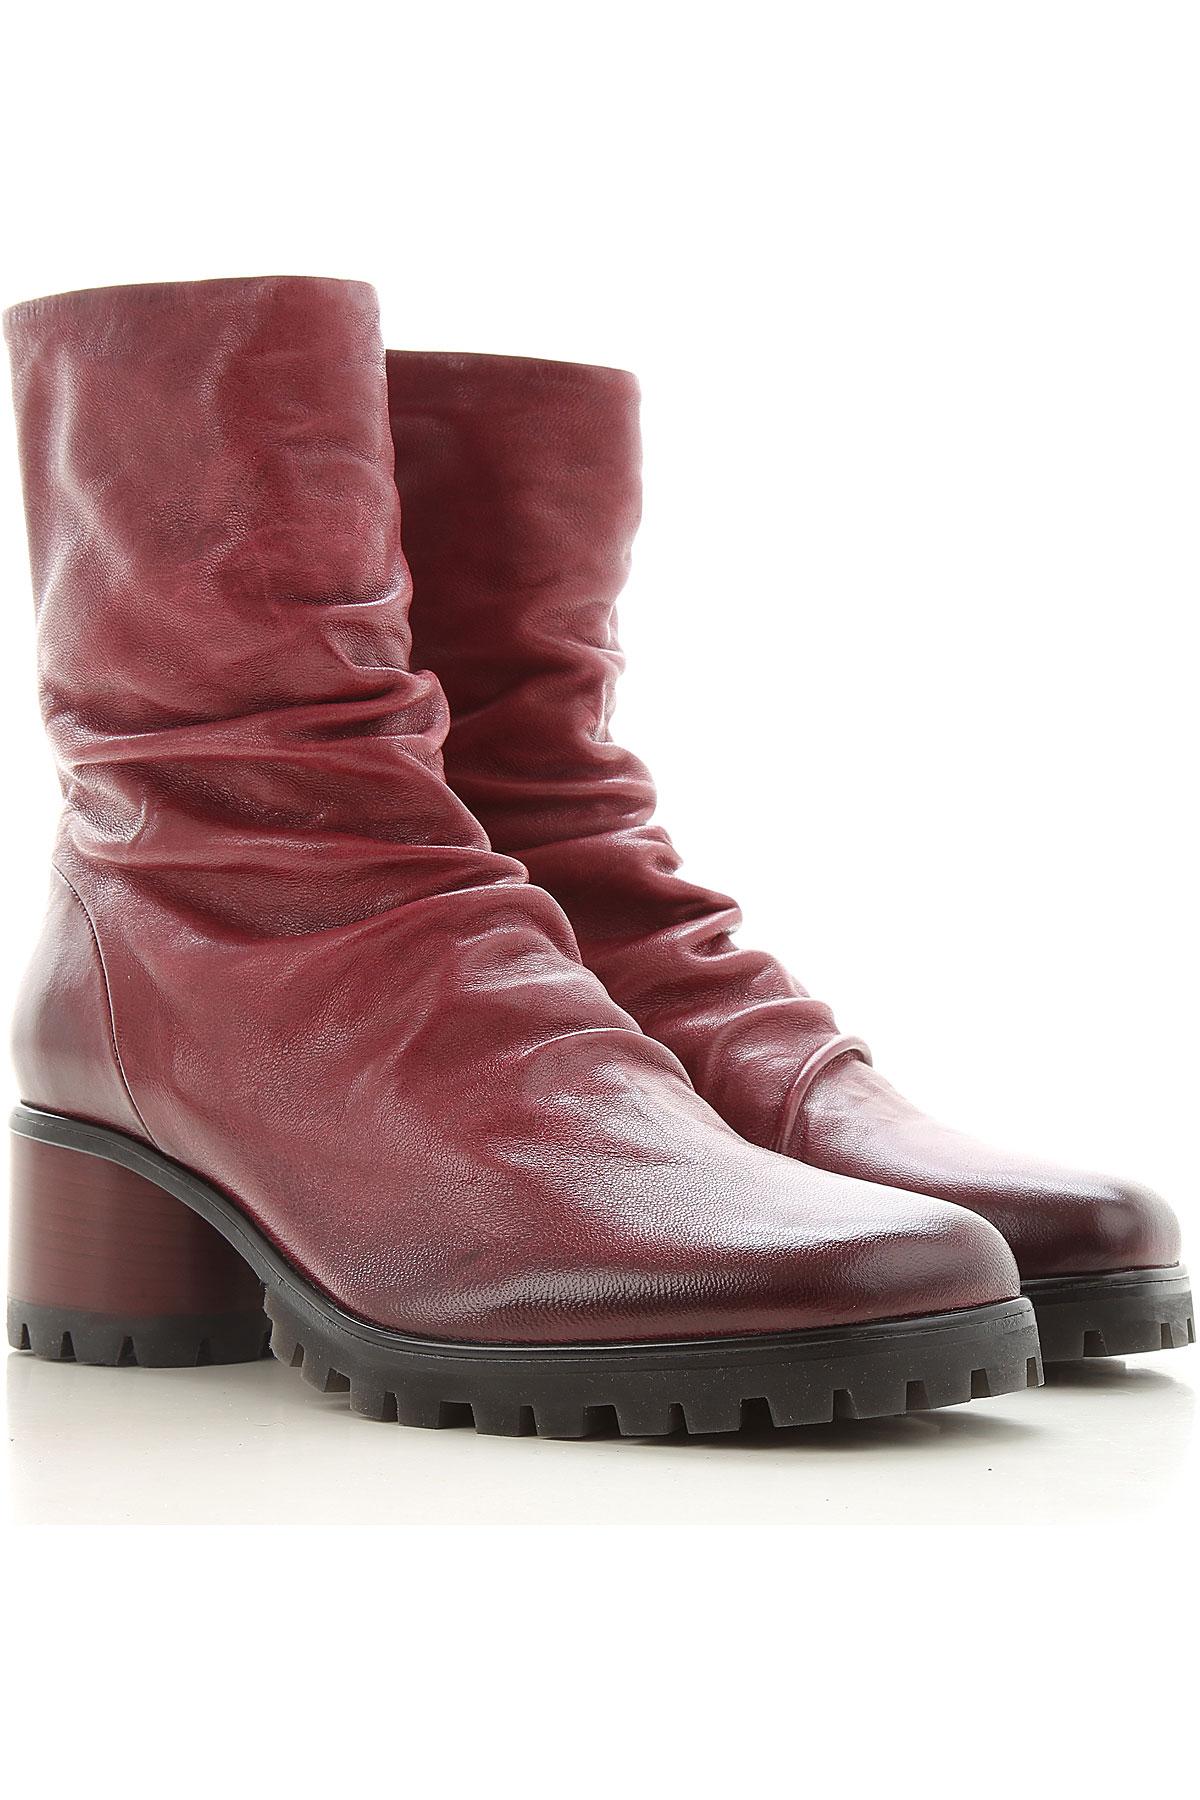 Halmanera Boots For Women, Booties, Bordeaux, Leather, 2019, 3.5 4.5 5.5